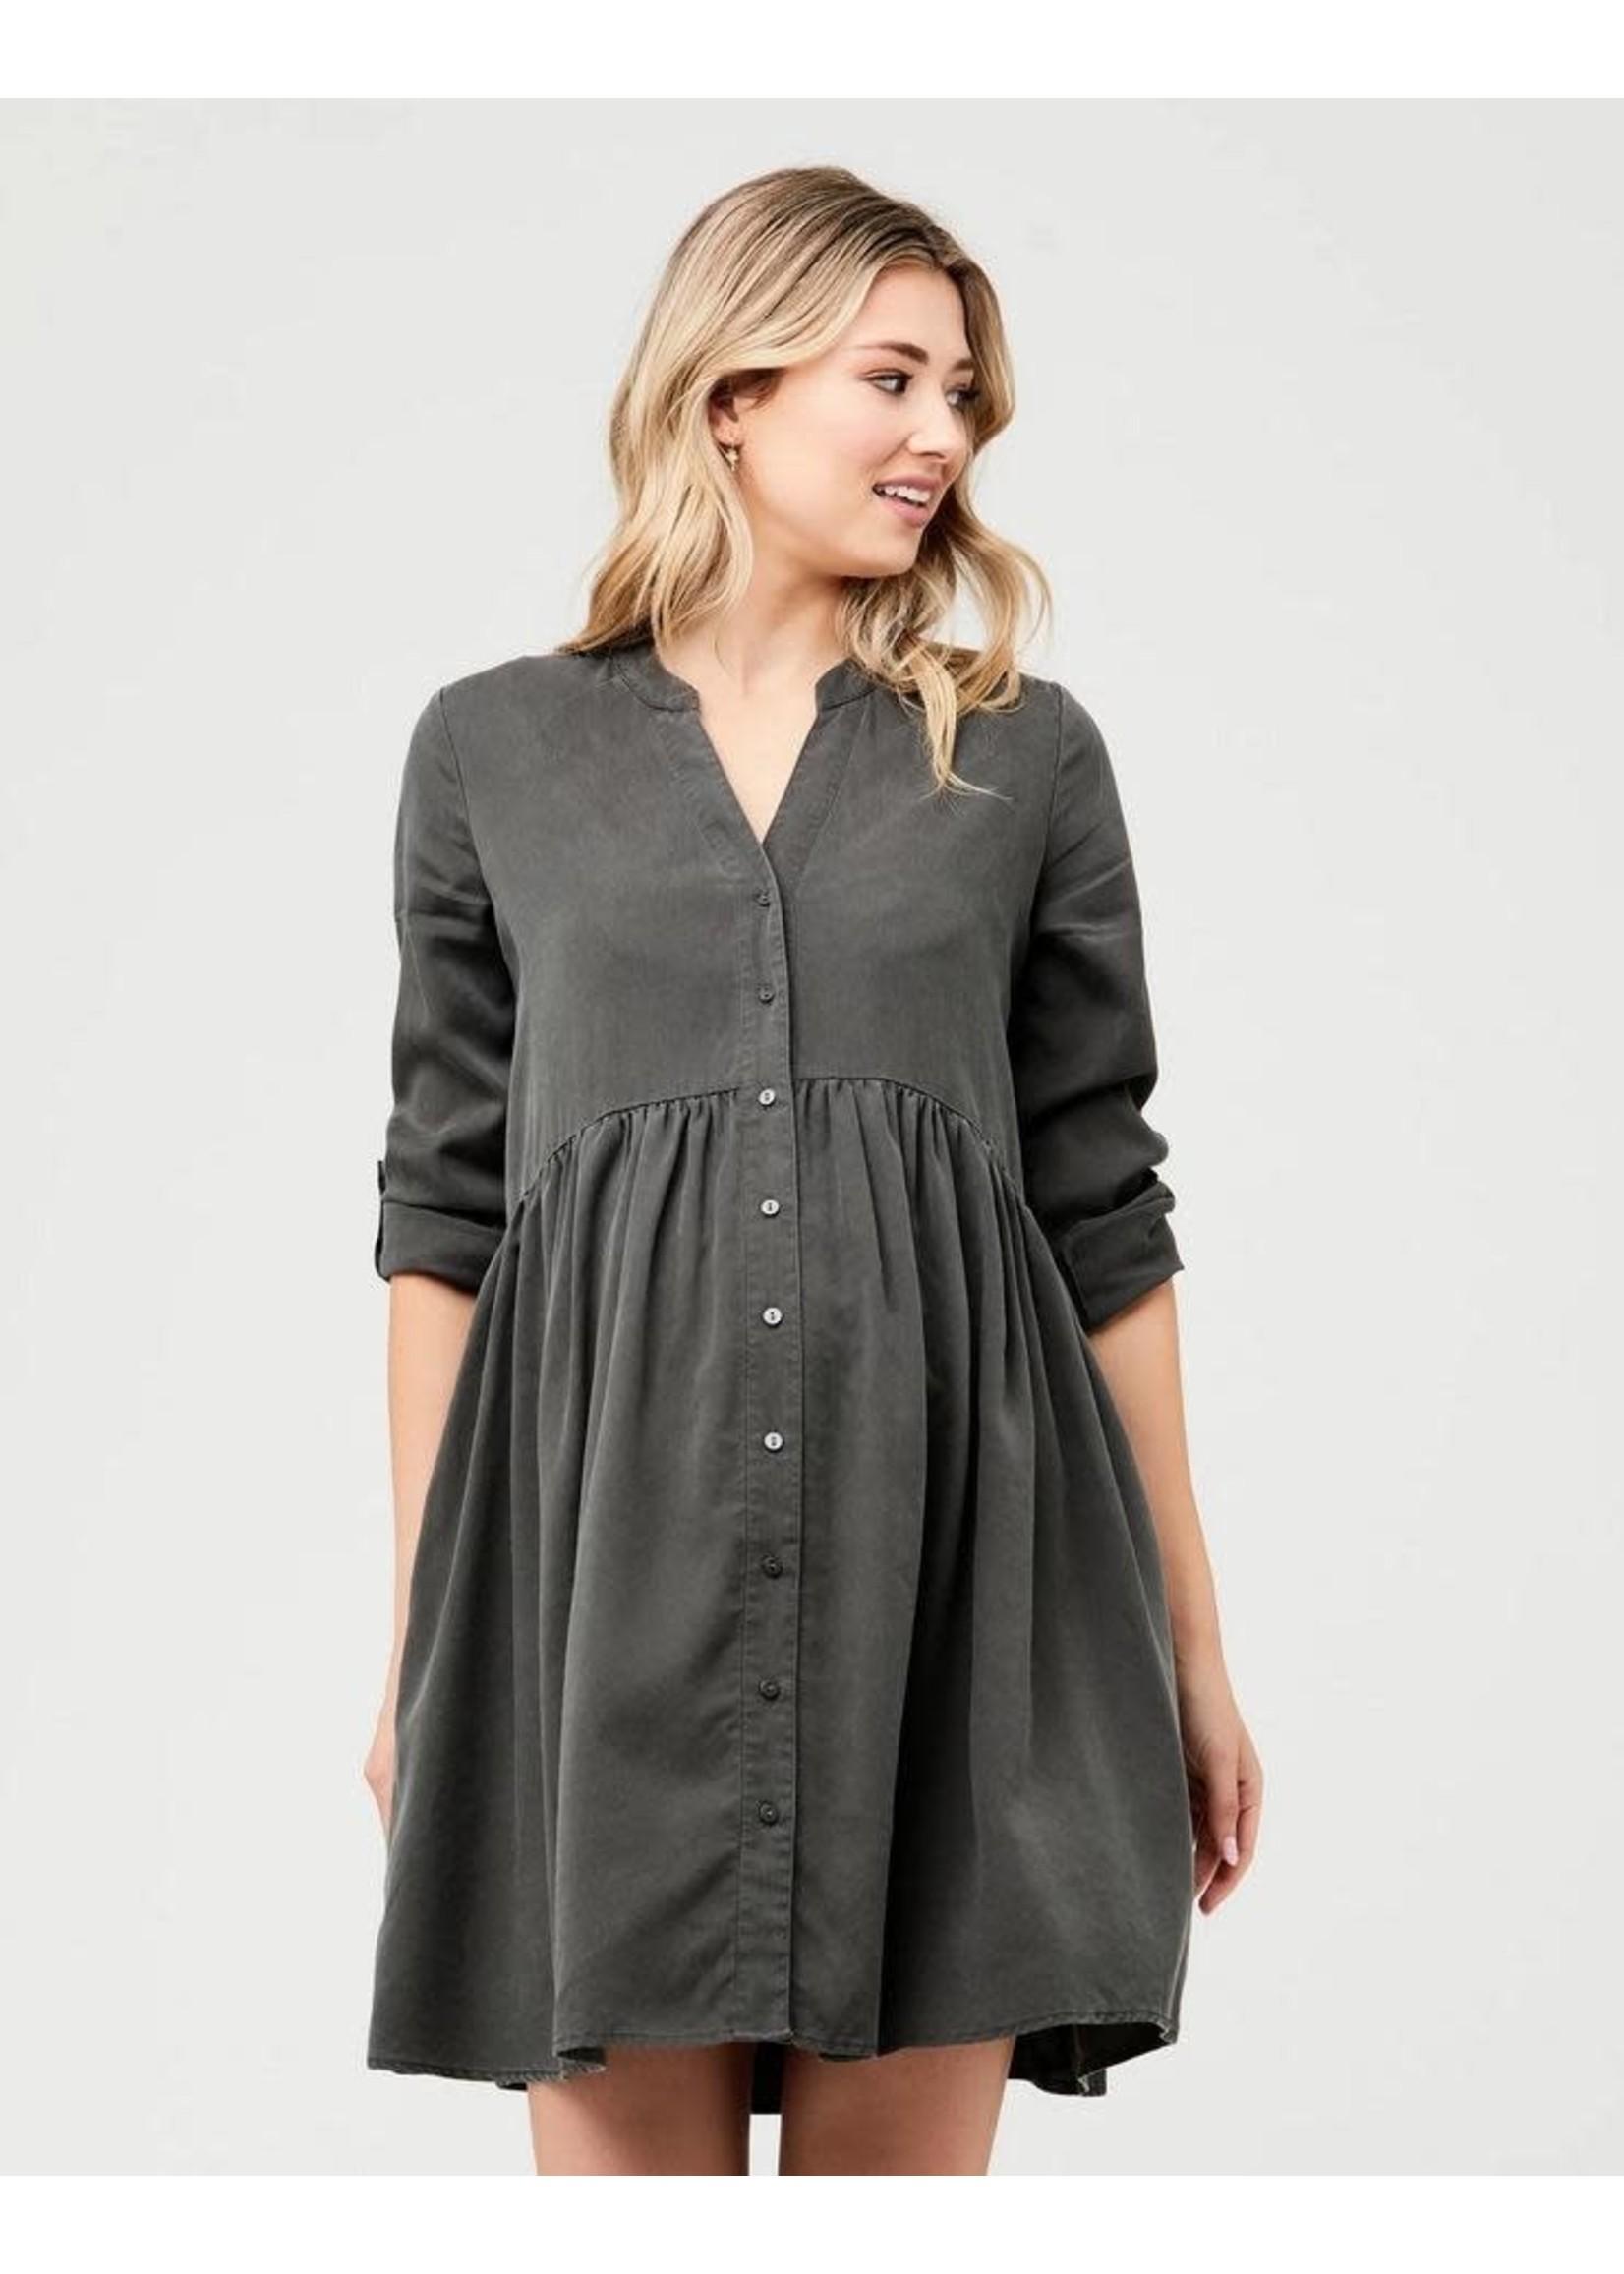 Ripe Maternity Ripe Maternity, Demi Tencel Dress in Olive